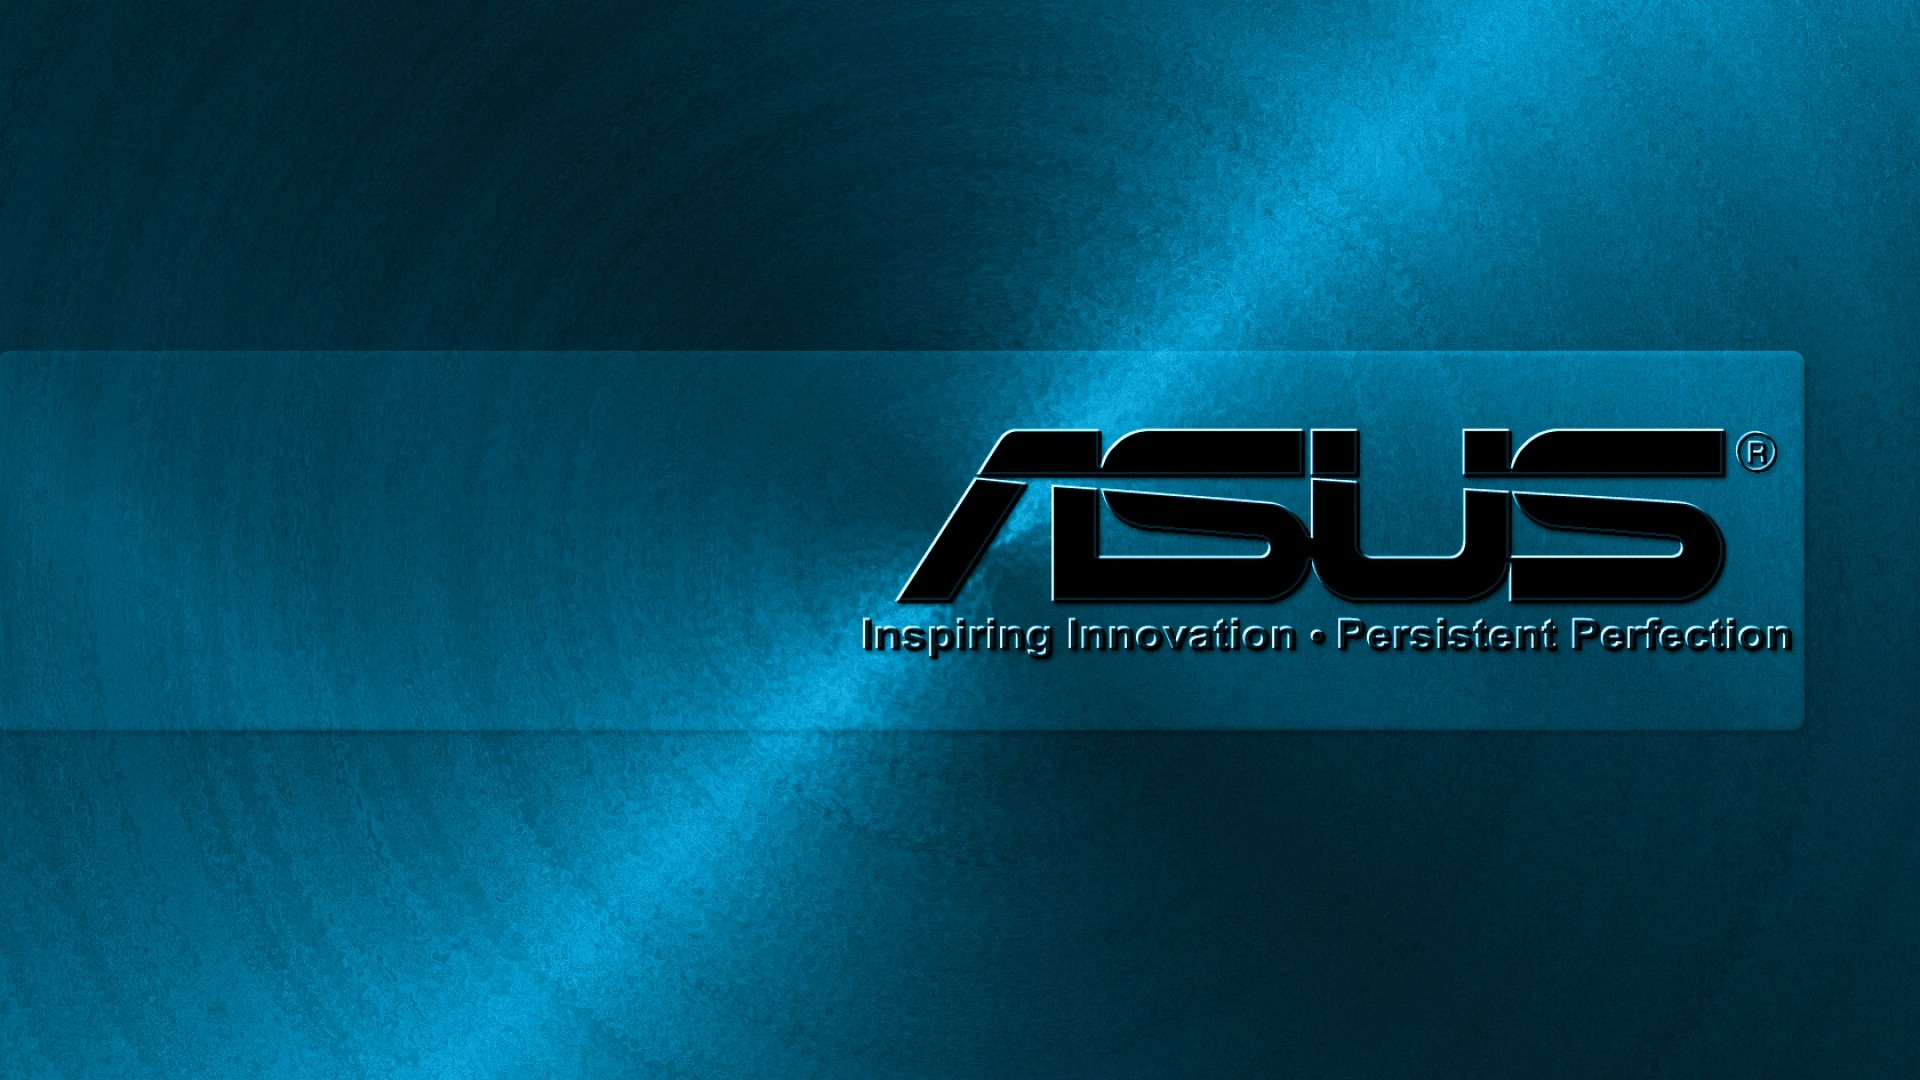 Asus-hd-wallpaper-set-10-windows-wallpapers – TechMoran